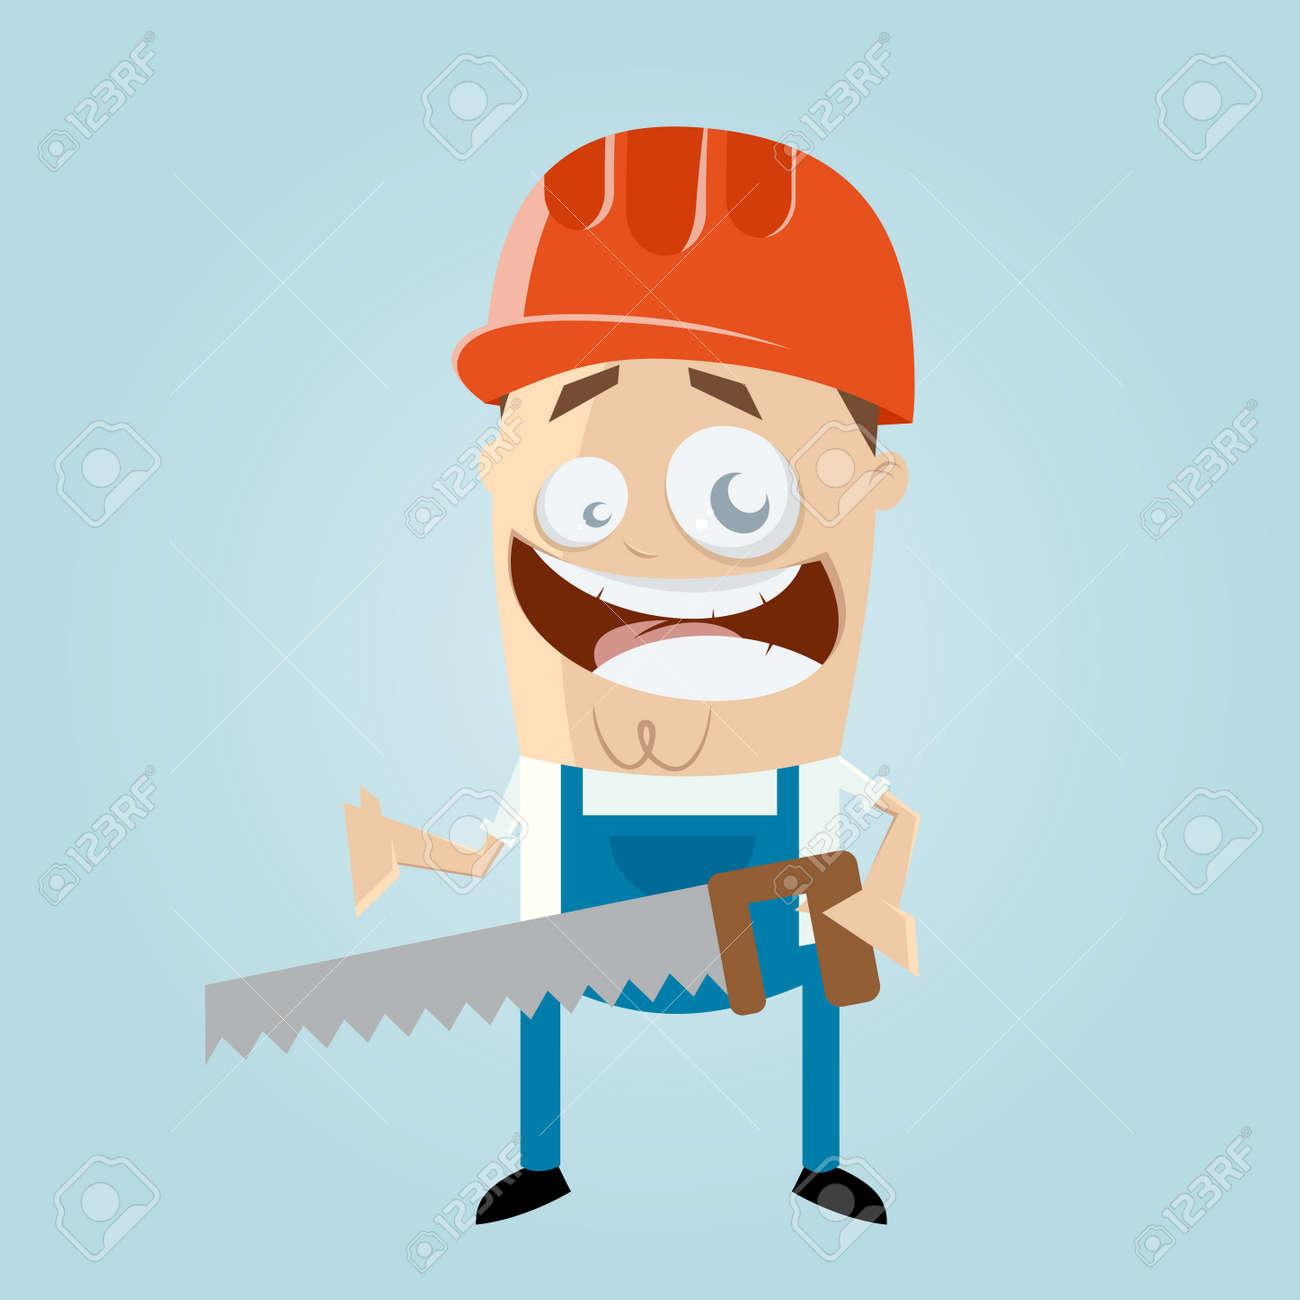 funny cartoon construction worker Standard-Bild - 38910836